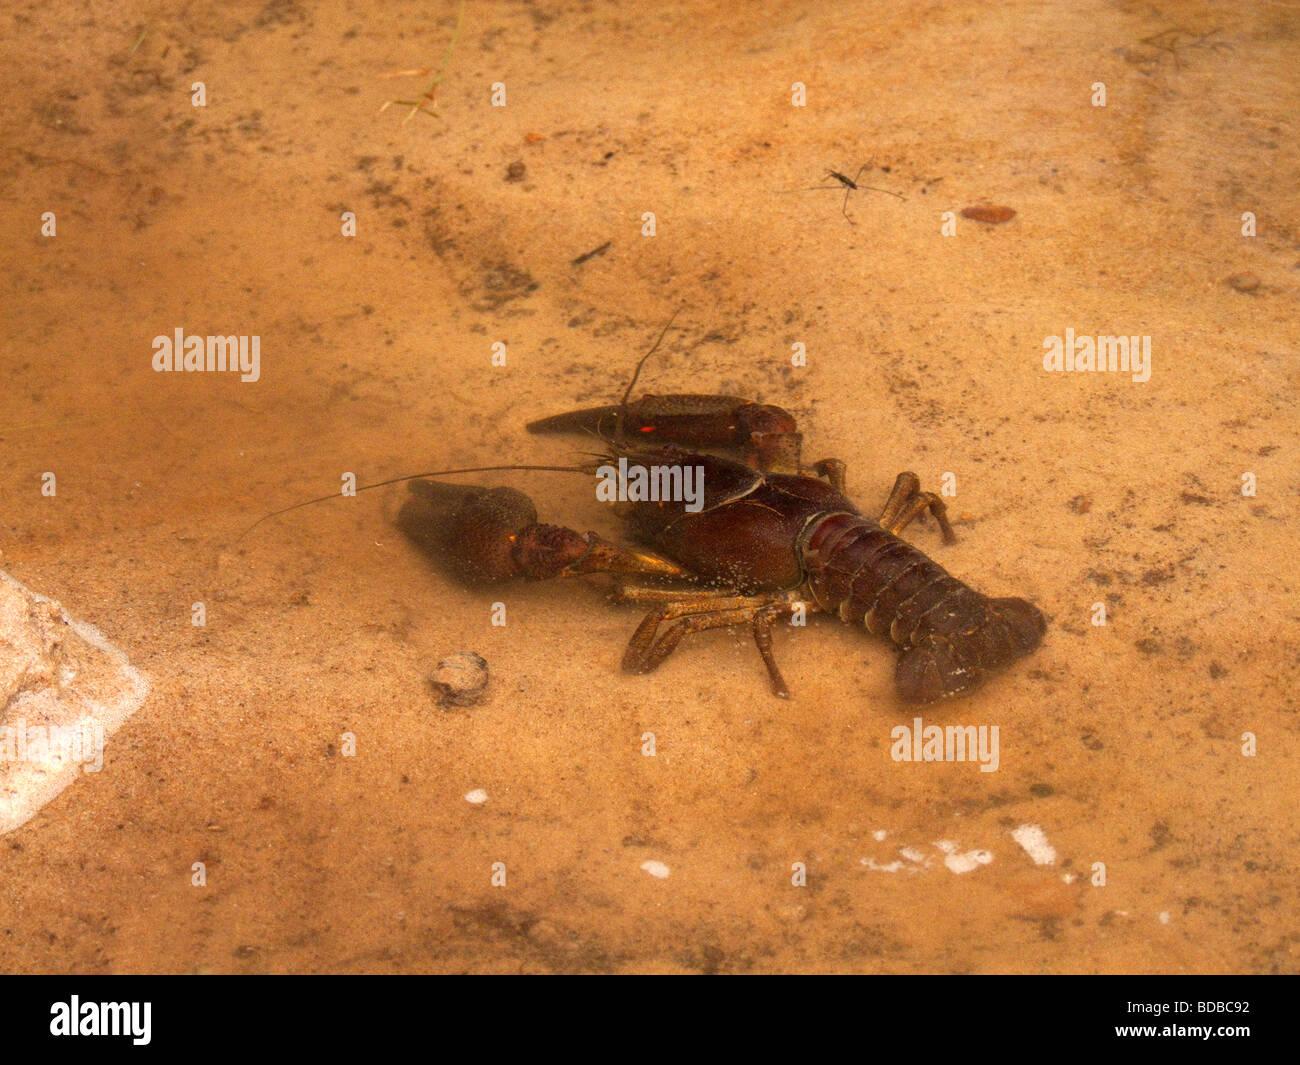 European crayfish - Astacus astacus - Stock Image